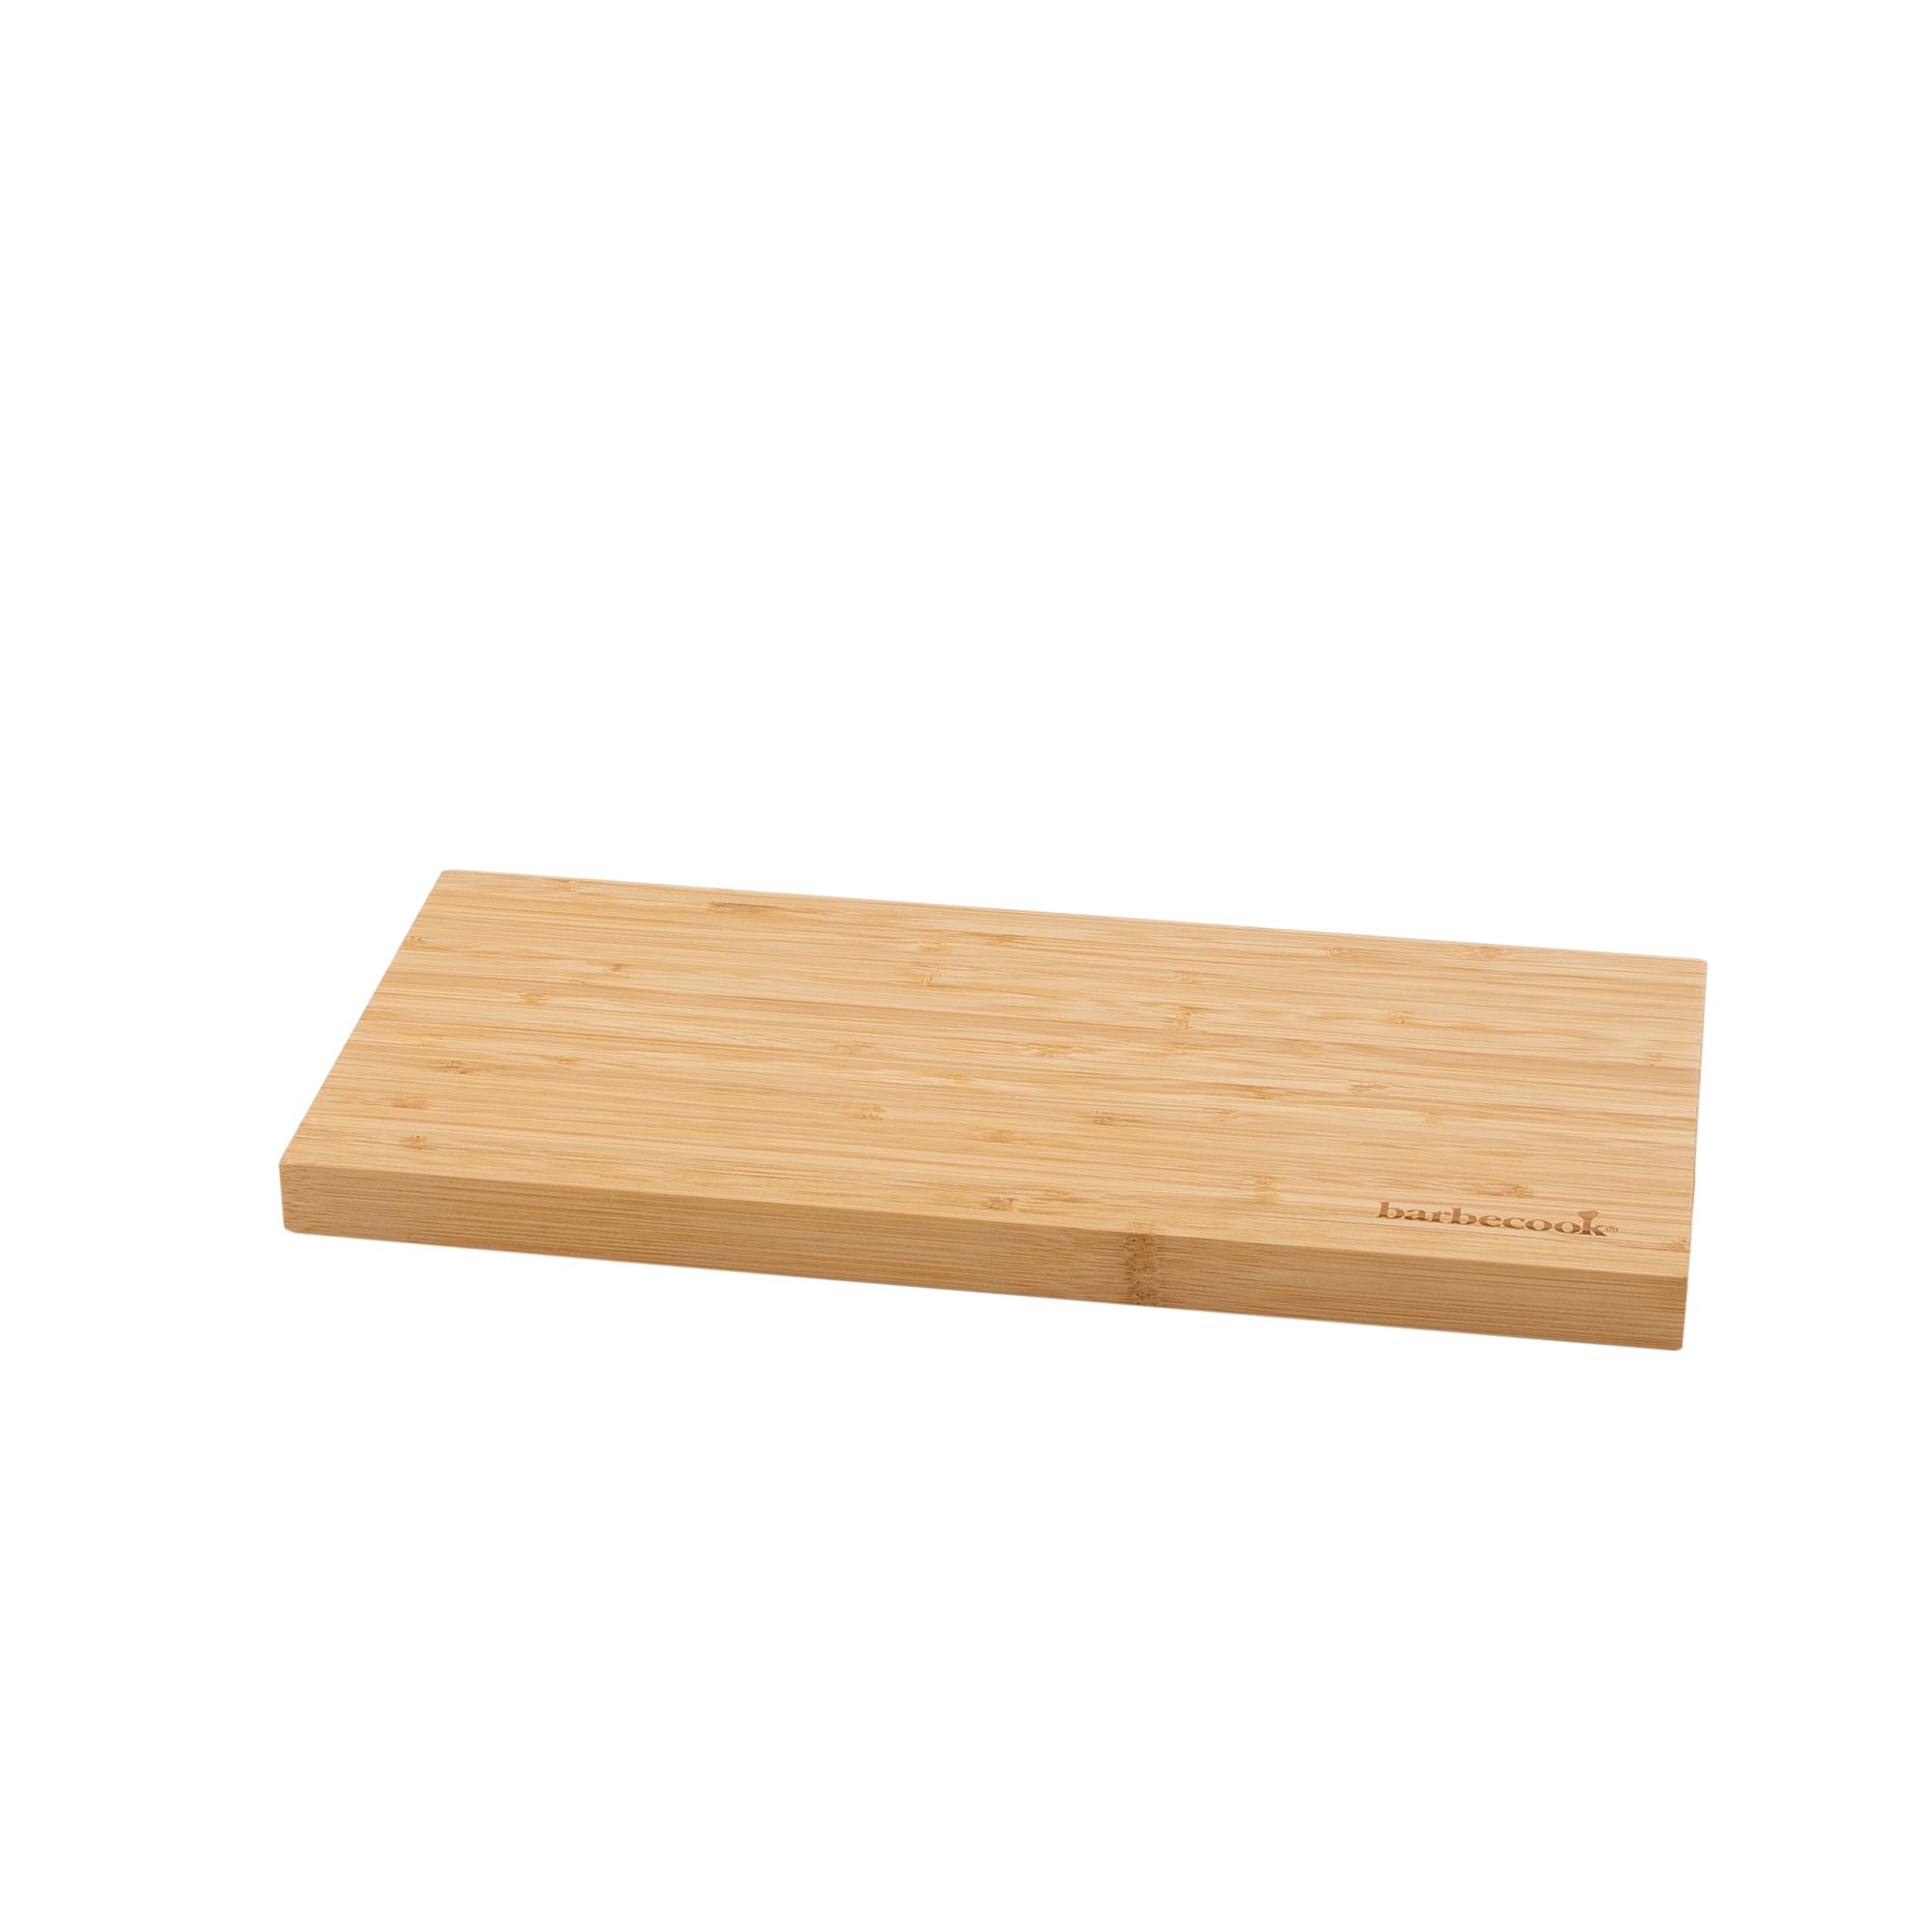 Barbecook bamboo cutting board 33x16x2cm